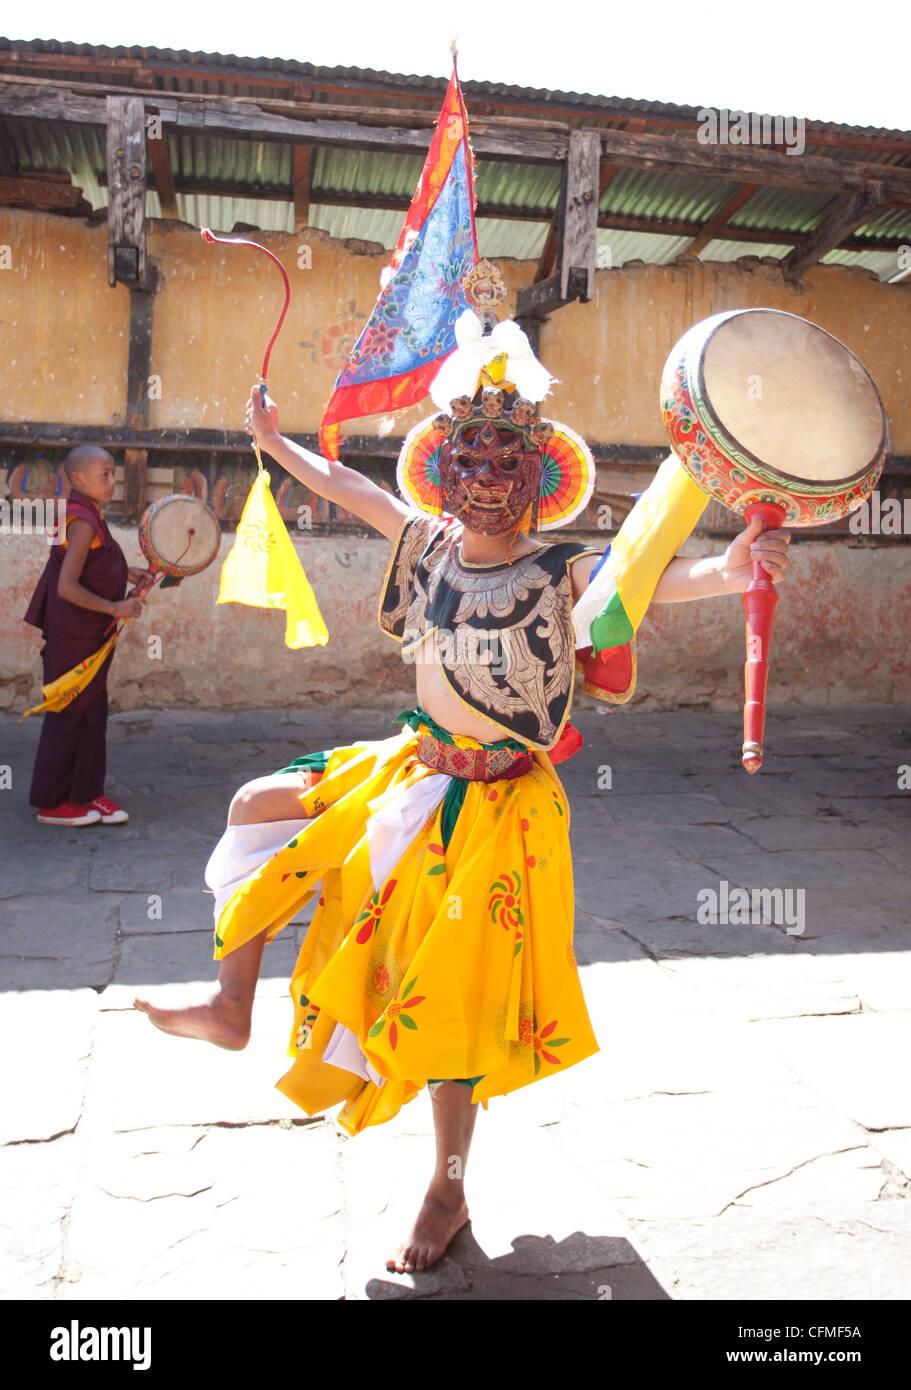 Buddhist monk in dance costume, Jakar, Bumthang, Bhutan, Asia - Stock Image